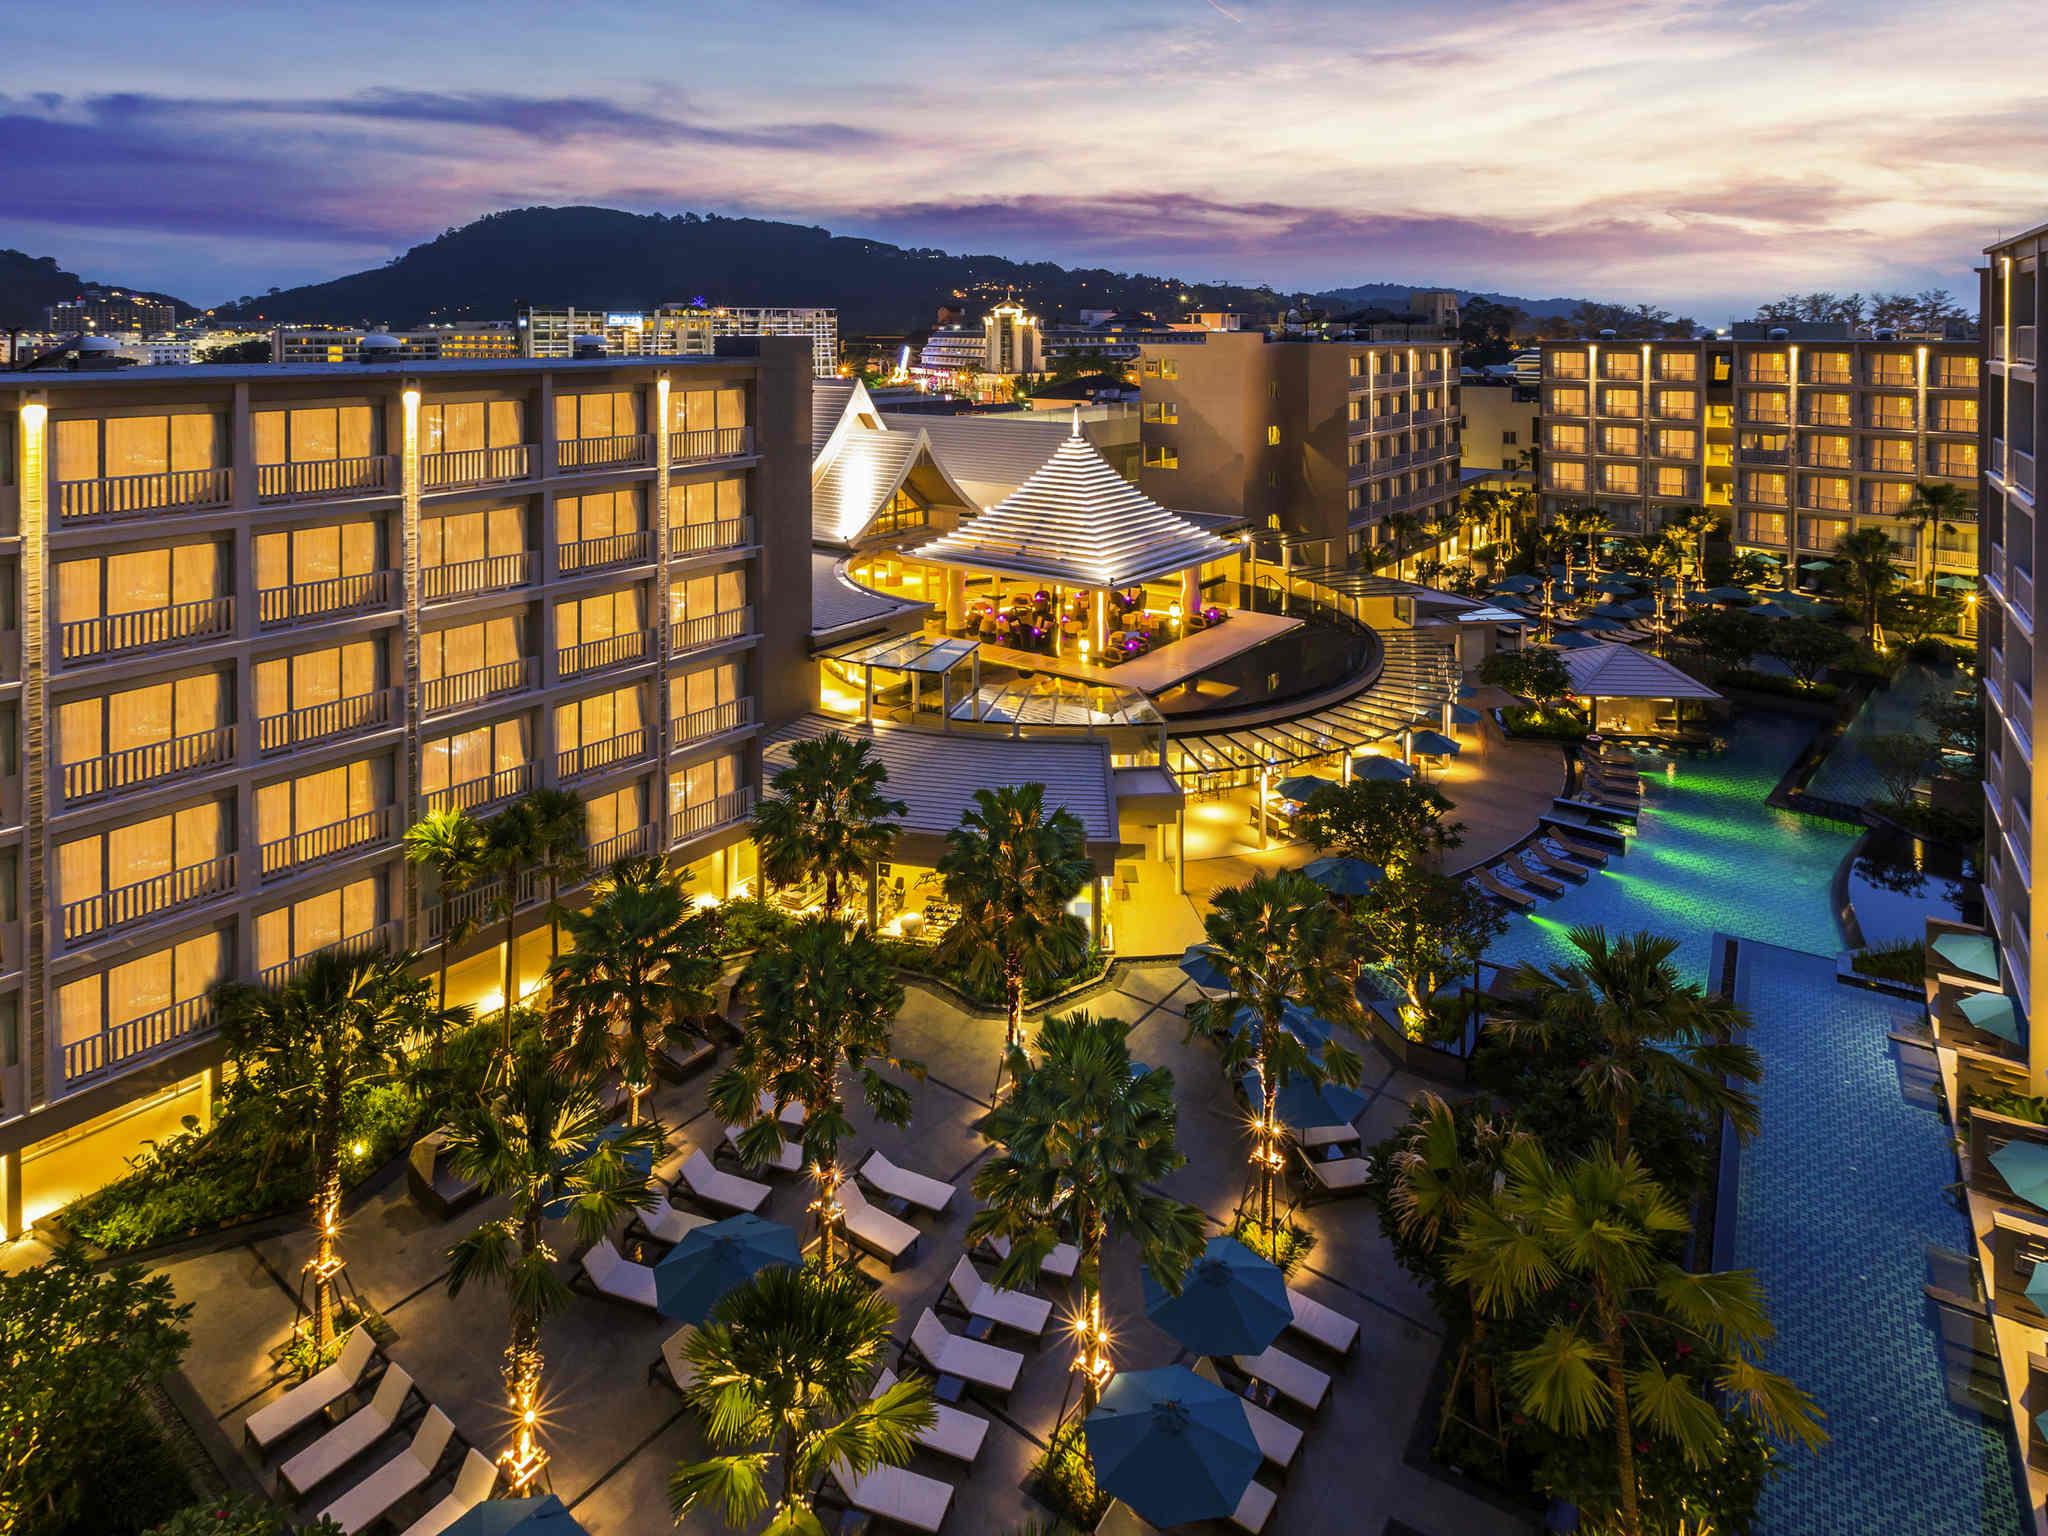 فندق - فندق Grand Mercure بوكيت باتونج